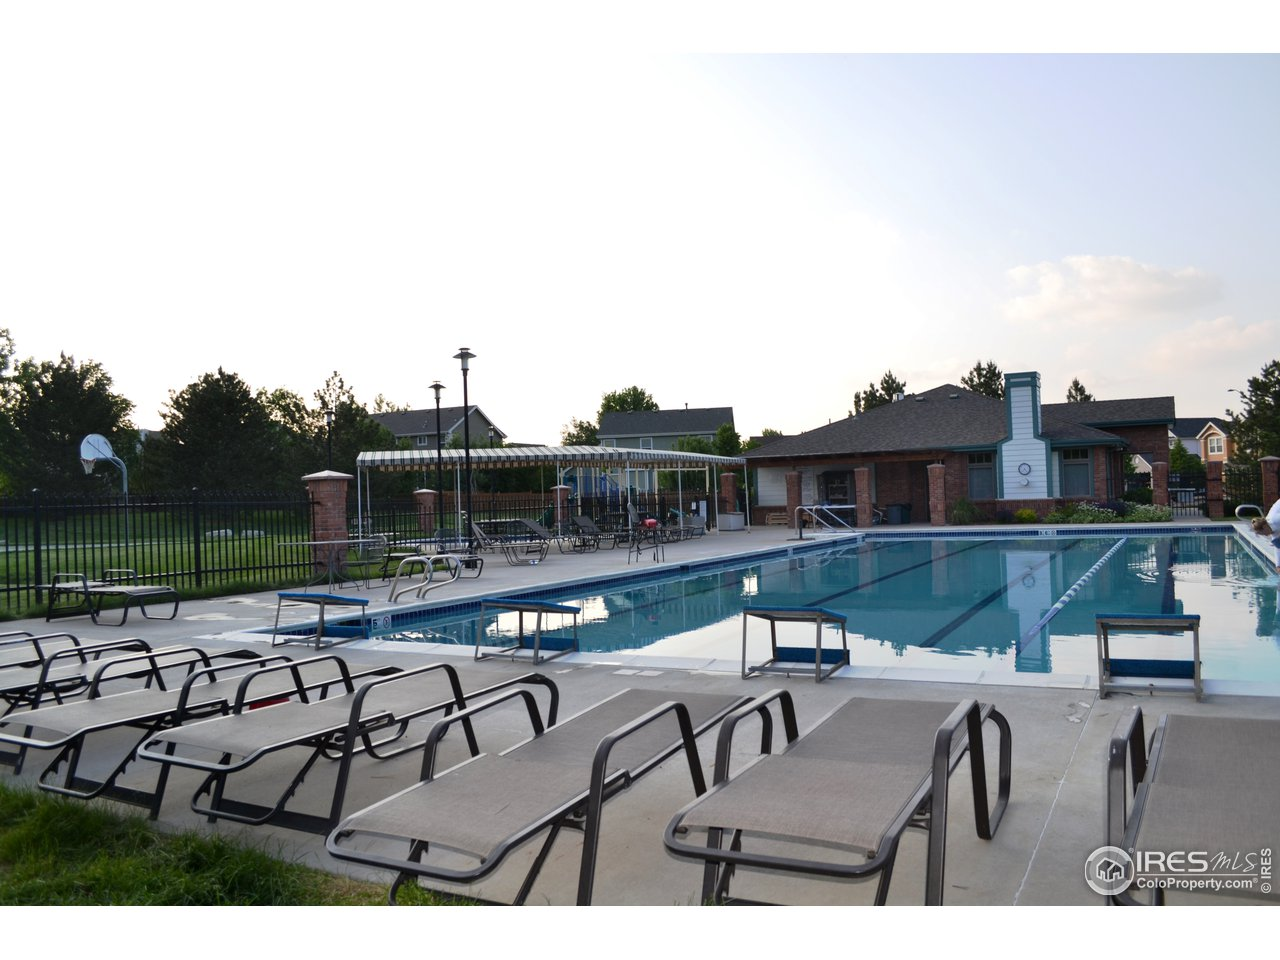 Neighborhood Pool, Tennis, Playground, Basketball